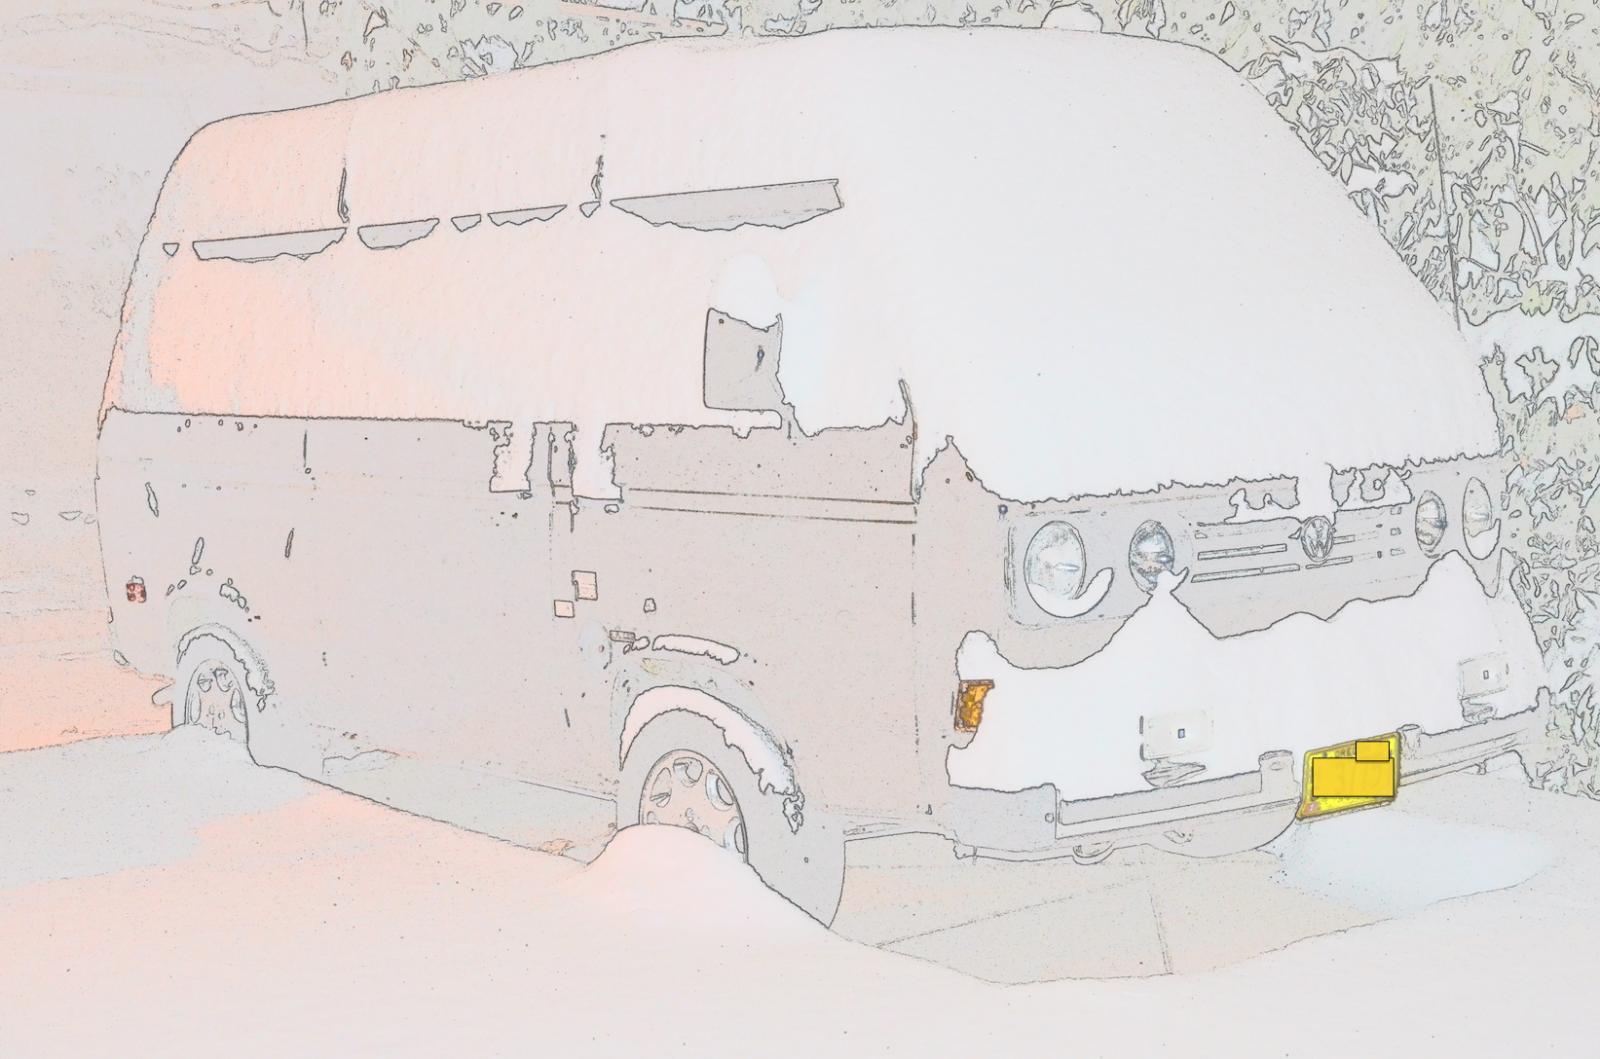 color sketch front of Vanagon in snow